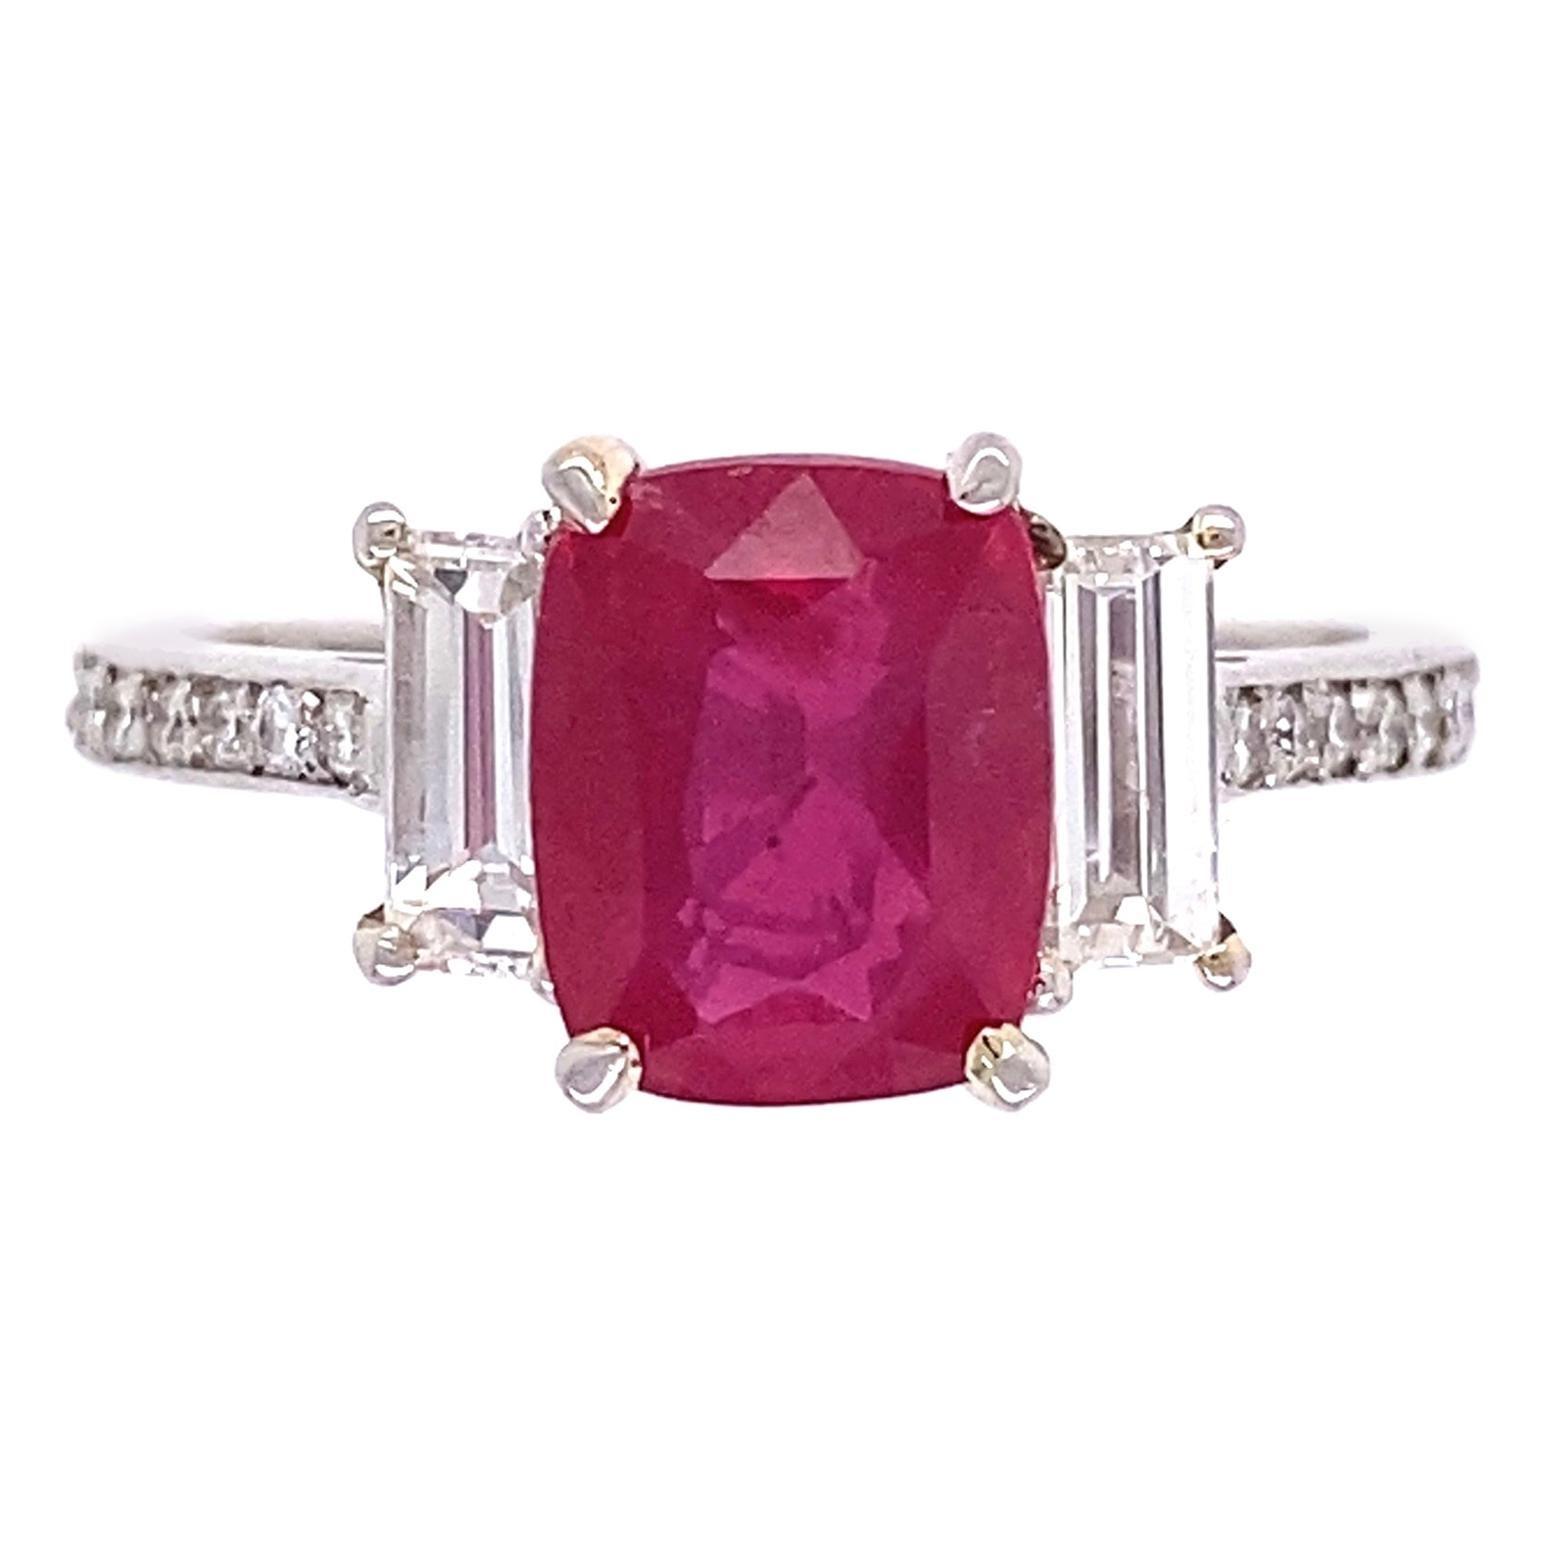 2.57 Carat Cushion Ruby and Diamond Cocktail Platinum Ring Estate Fine Jewelry